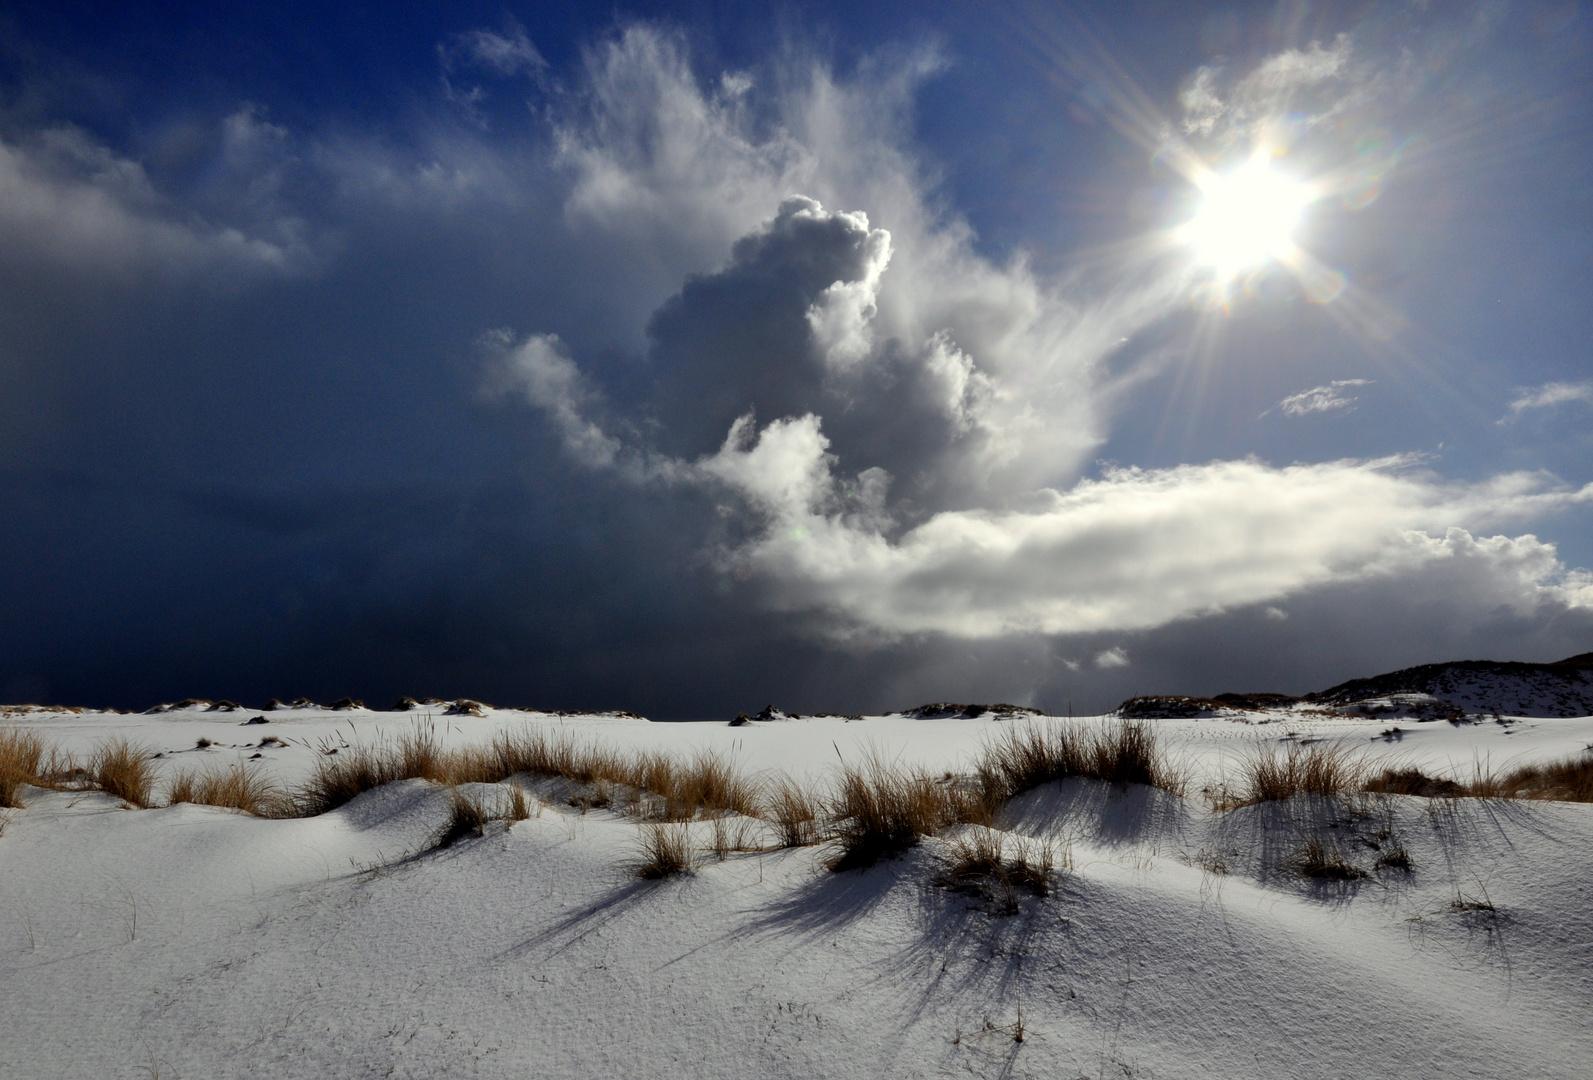 Wolkenbildung über den Wanderdünen